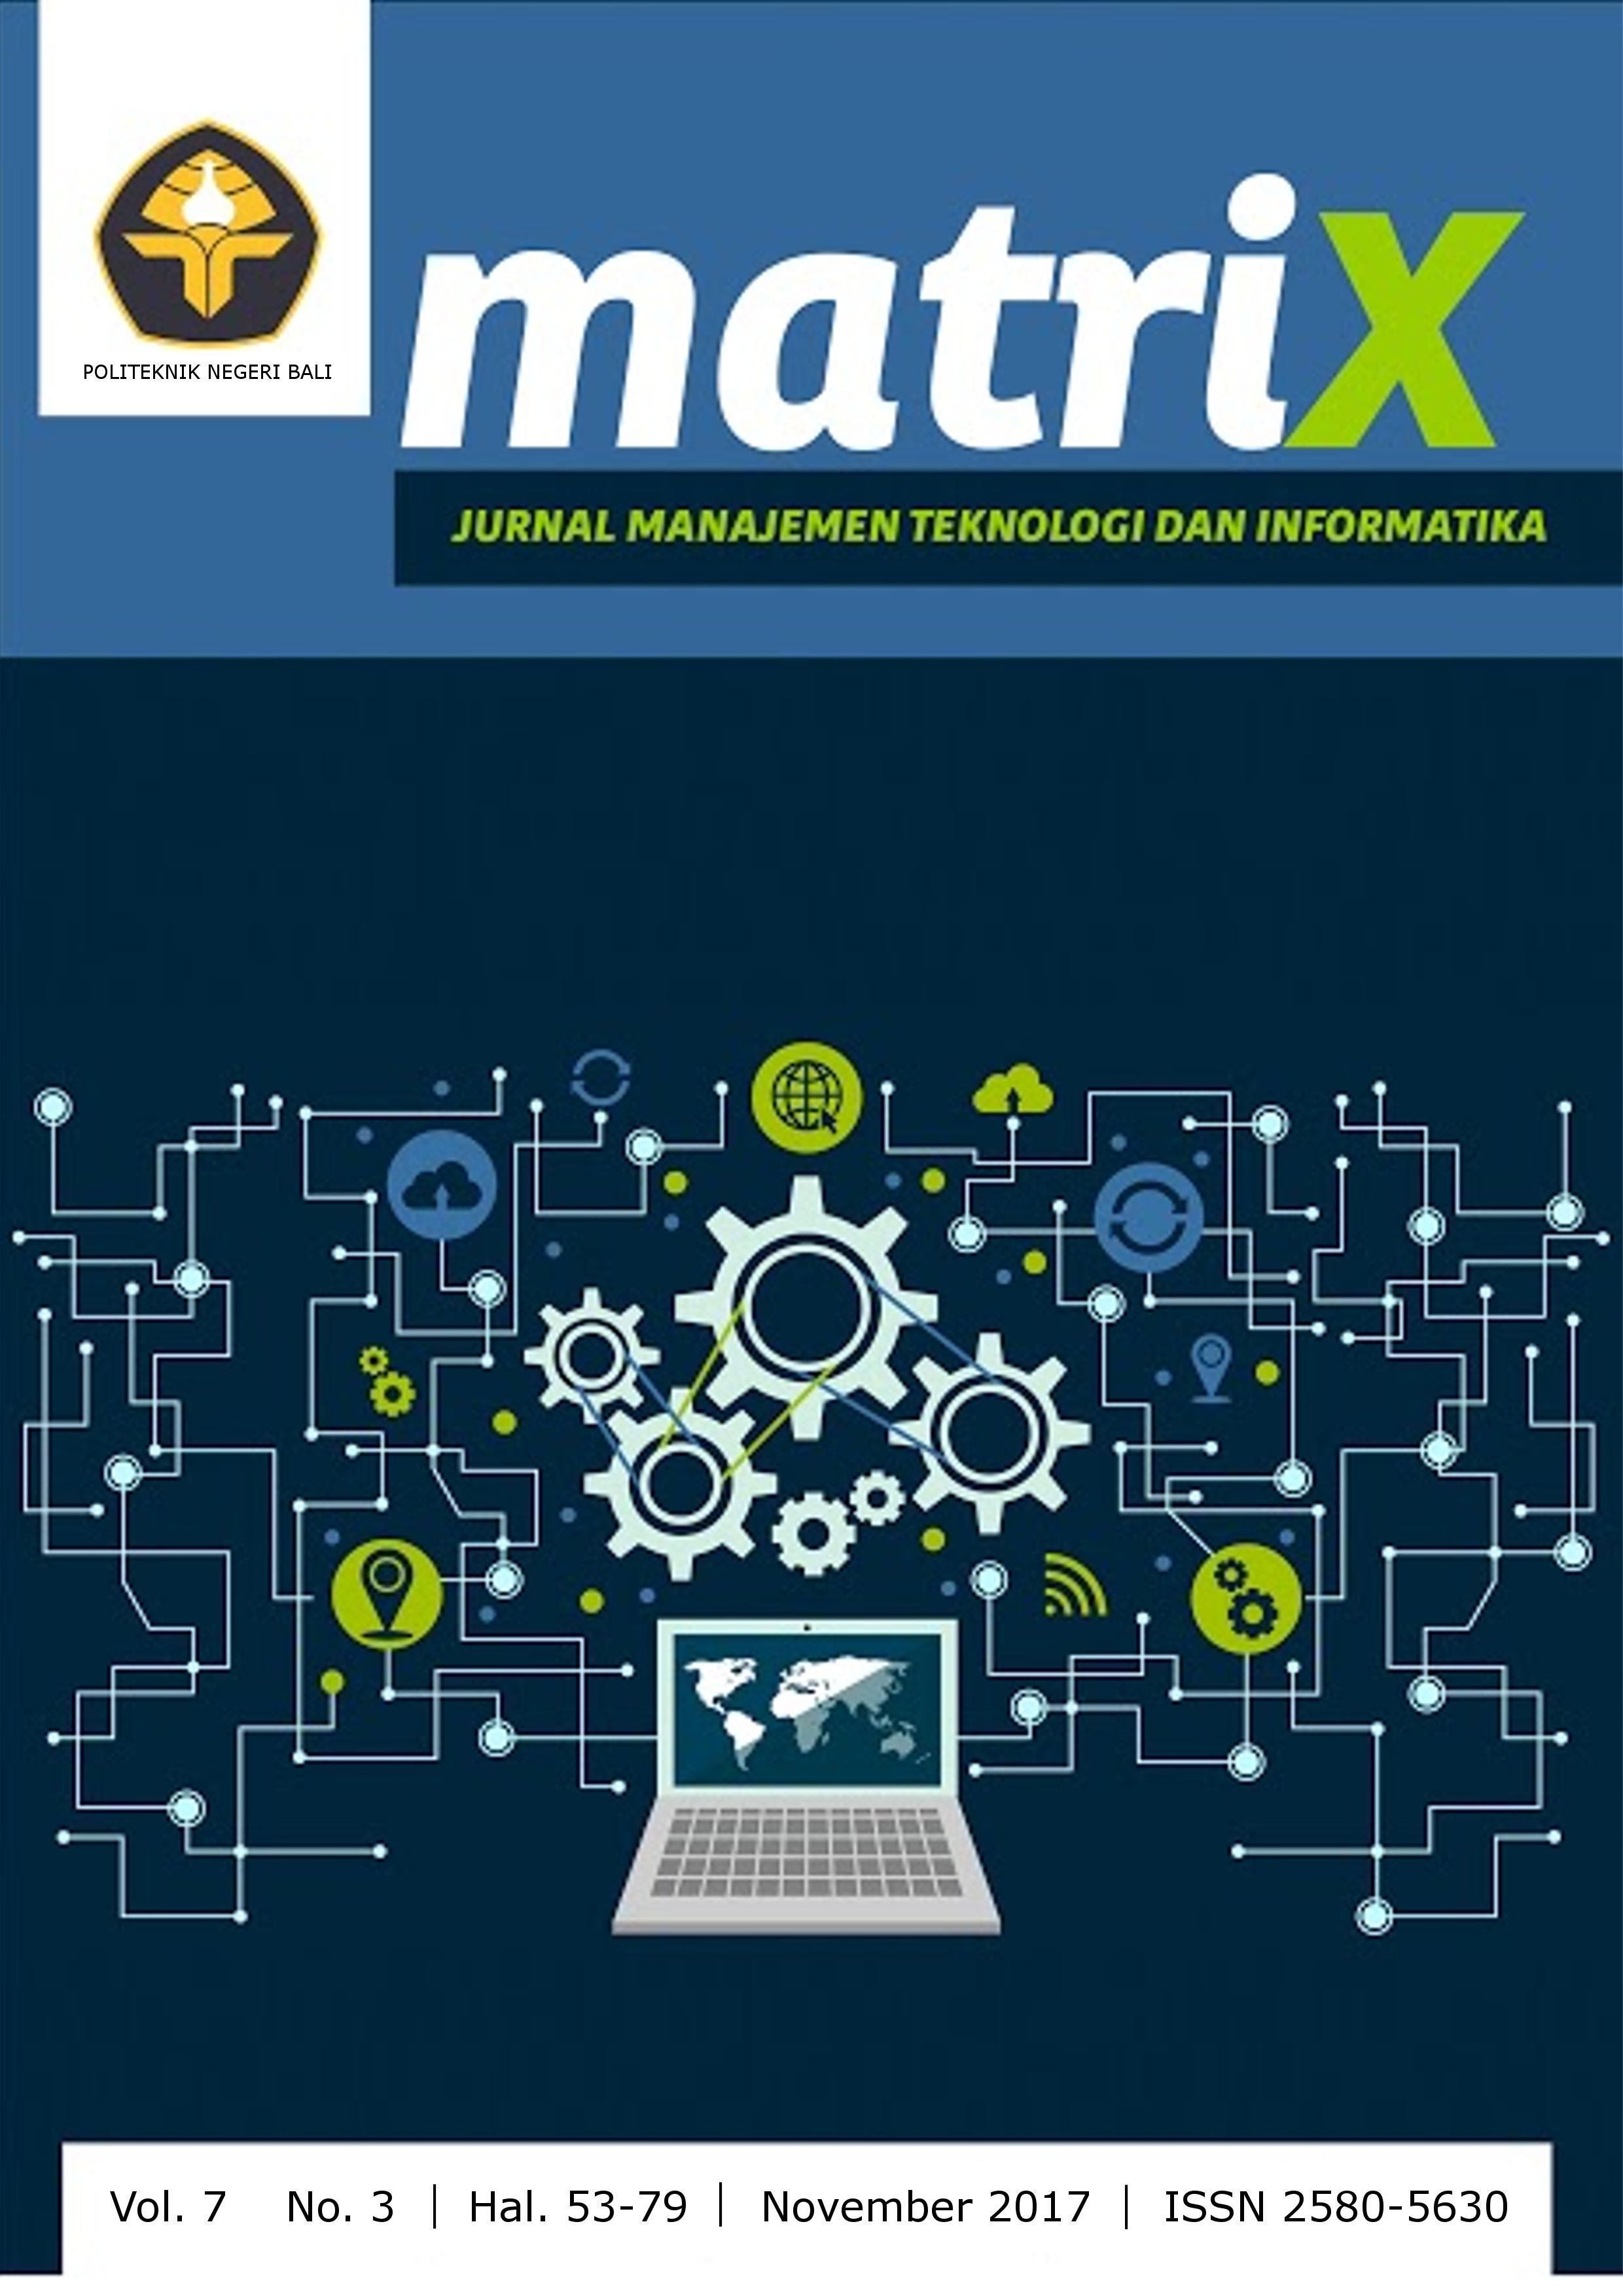 Matrix : Jurnal Manajemen Teknologi dan Informatika, Volume : 7, Nomor : 3, November 2017